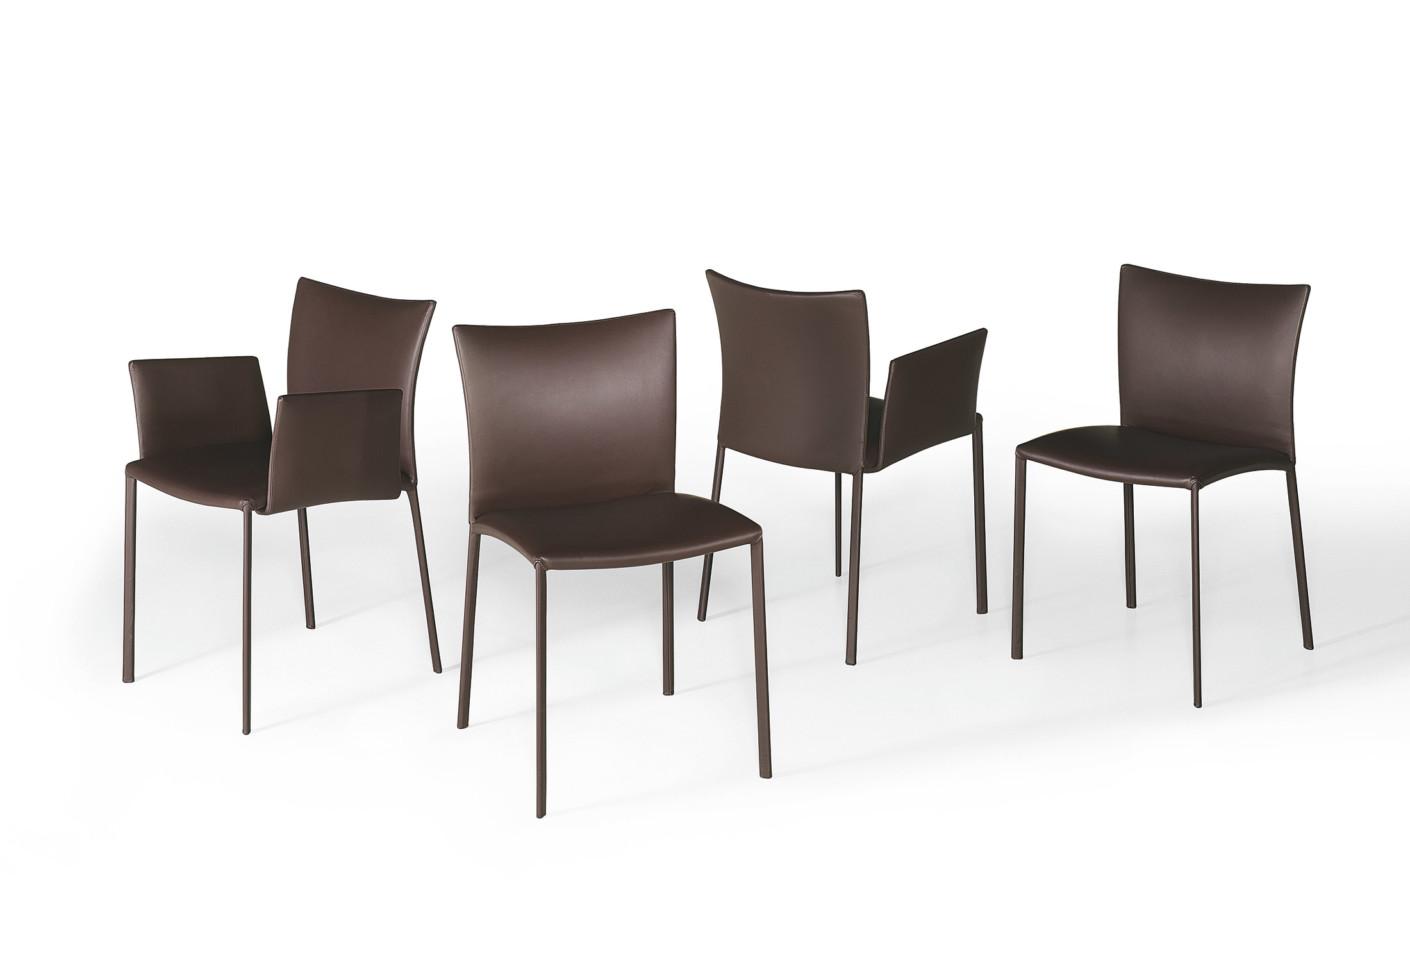 2076 nobile soft leder von draenert stylepark. Black Bedroom Furniture Sets. Home Design Ideas